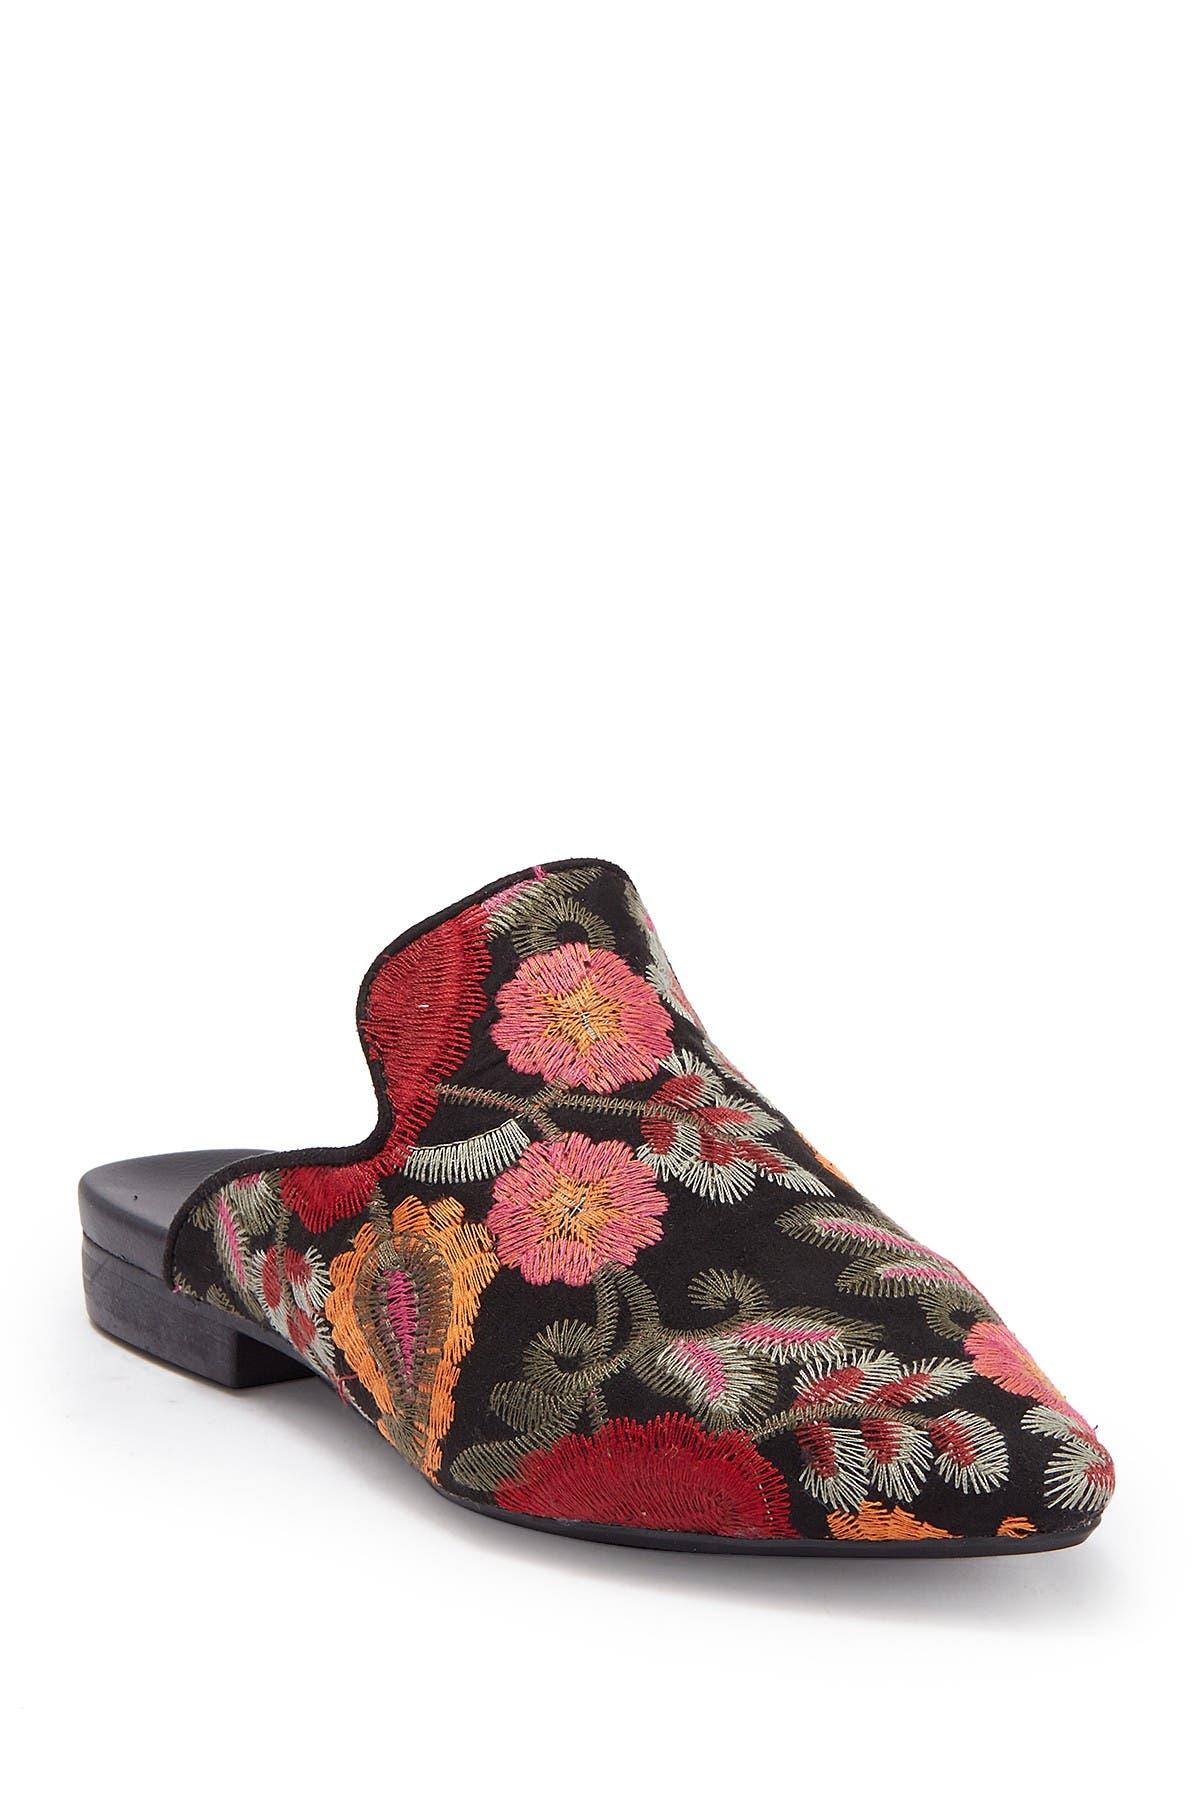 Image of MIA Jace Floral Print Mule